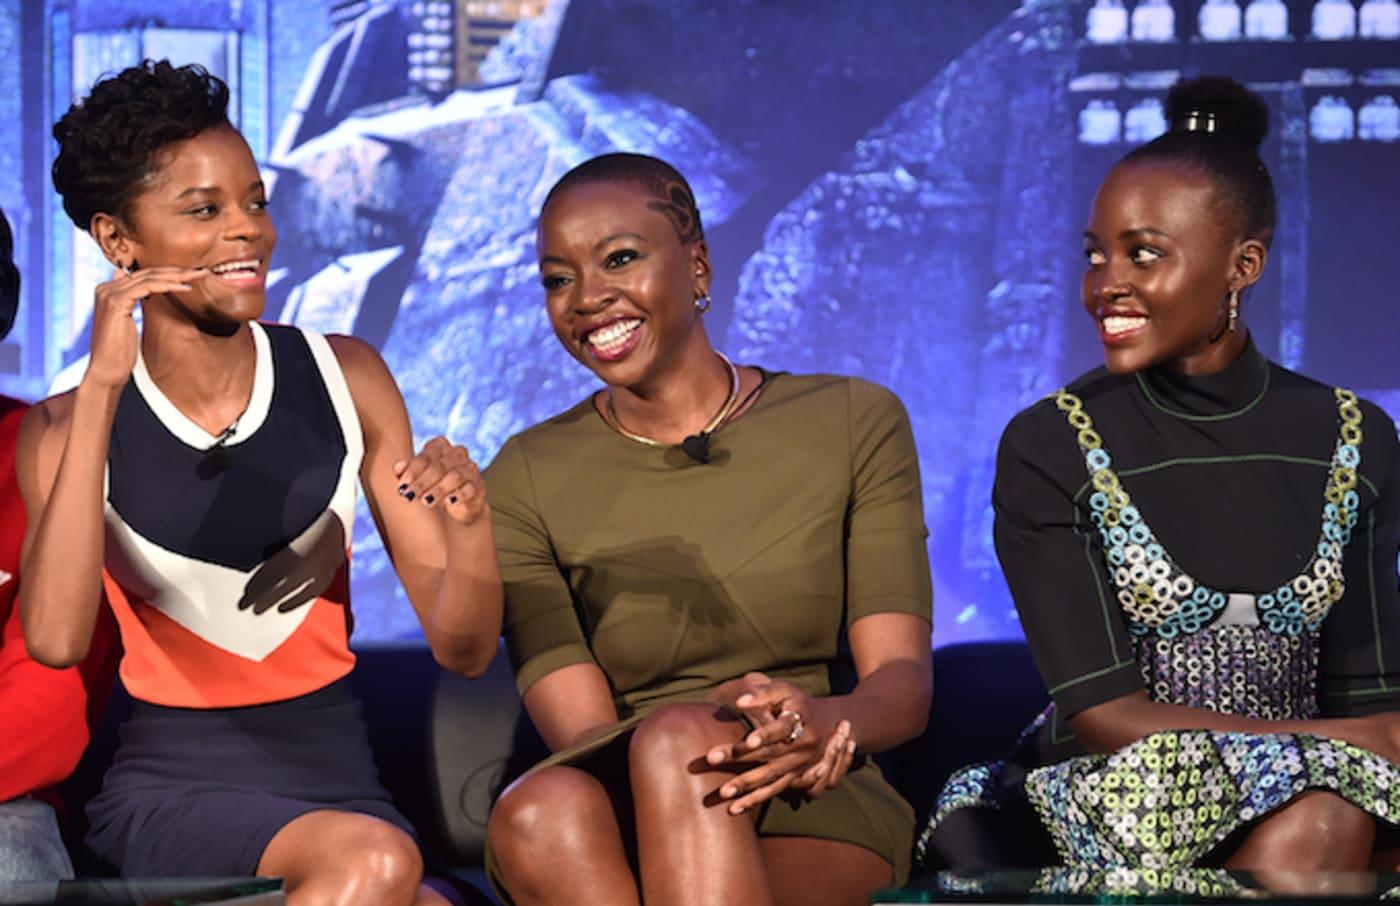 'Black Panther' cast members Letitia Wright, Danai Gurira and Lupita Nyong'o